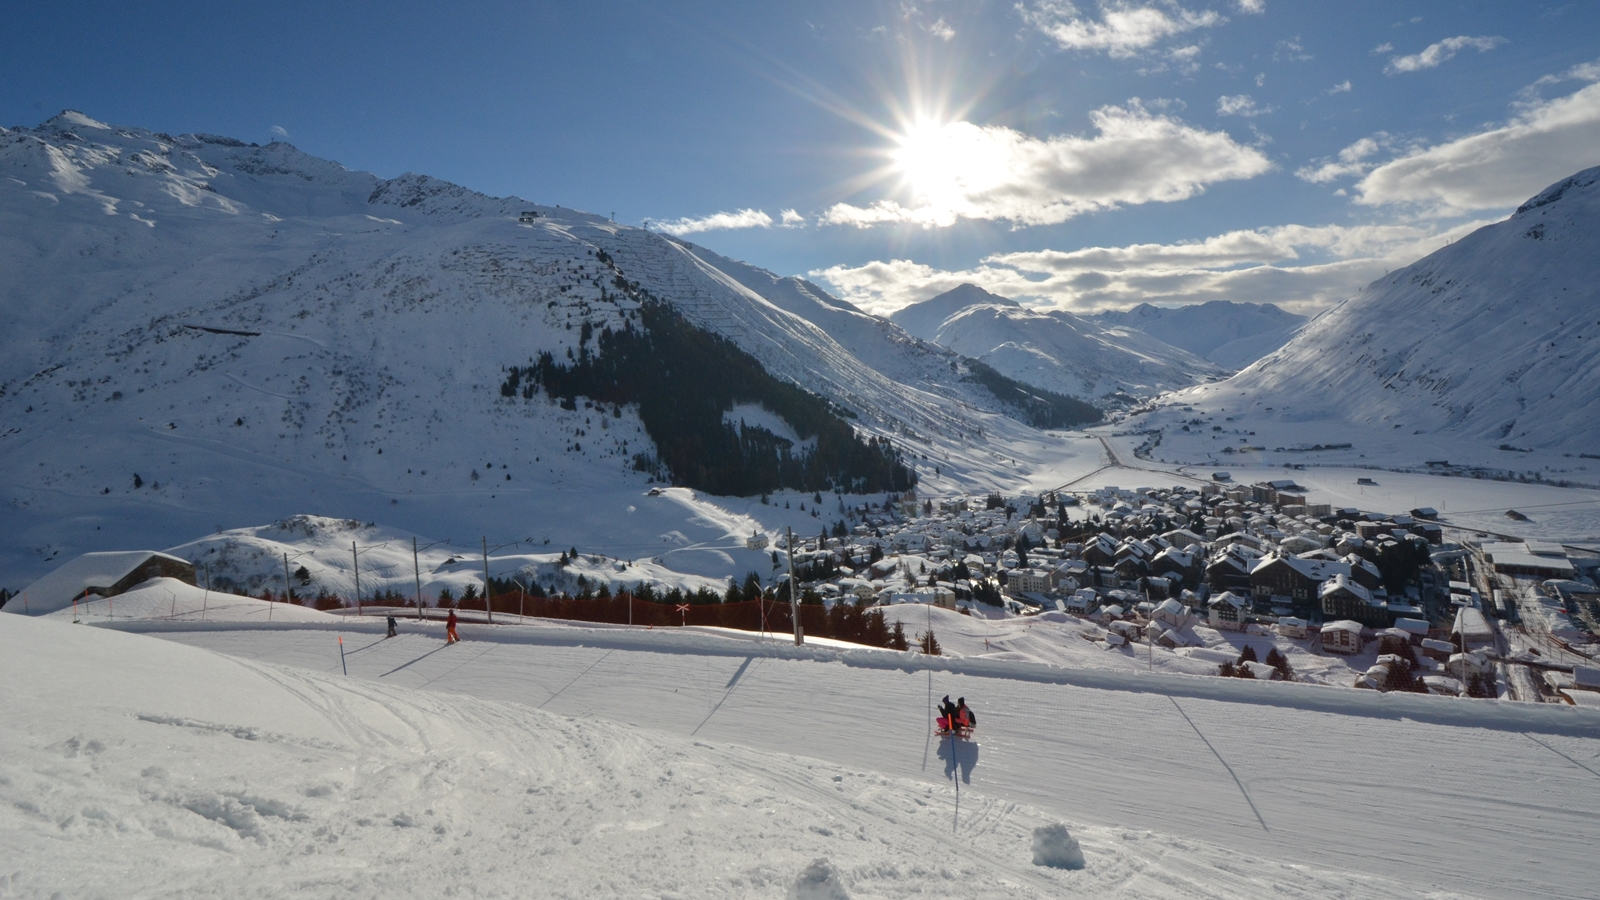 Sledding | Corporate Event | Snow Adventure | Teambuilding